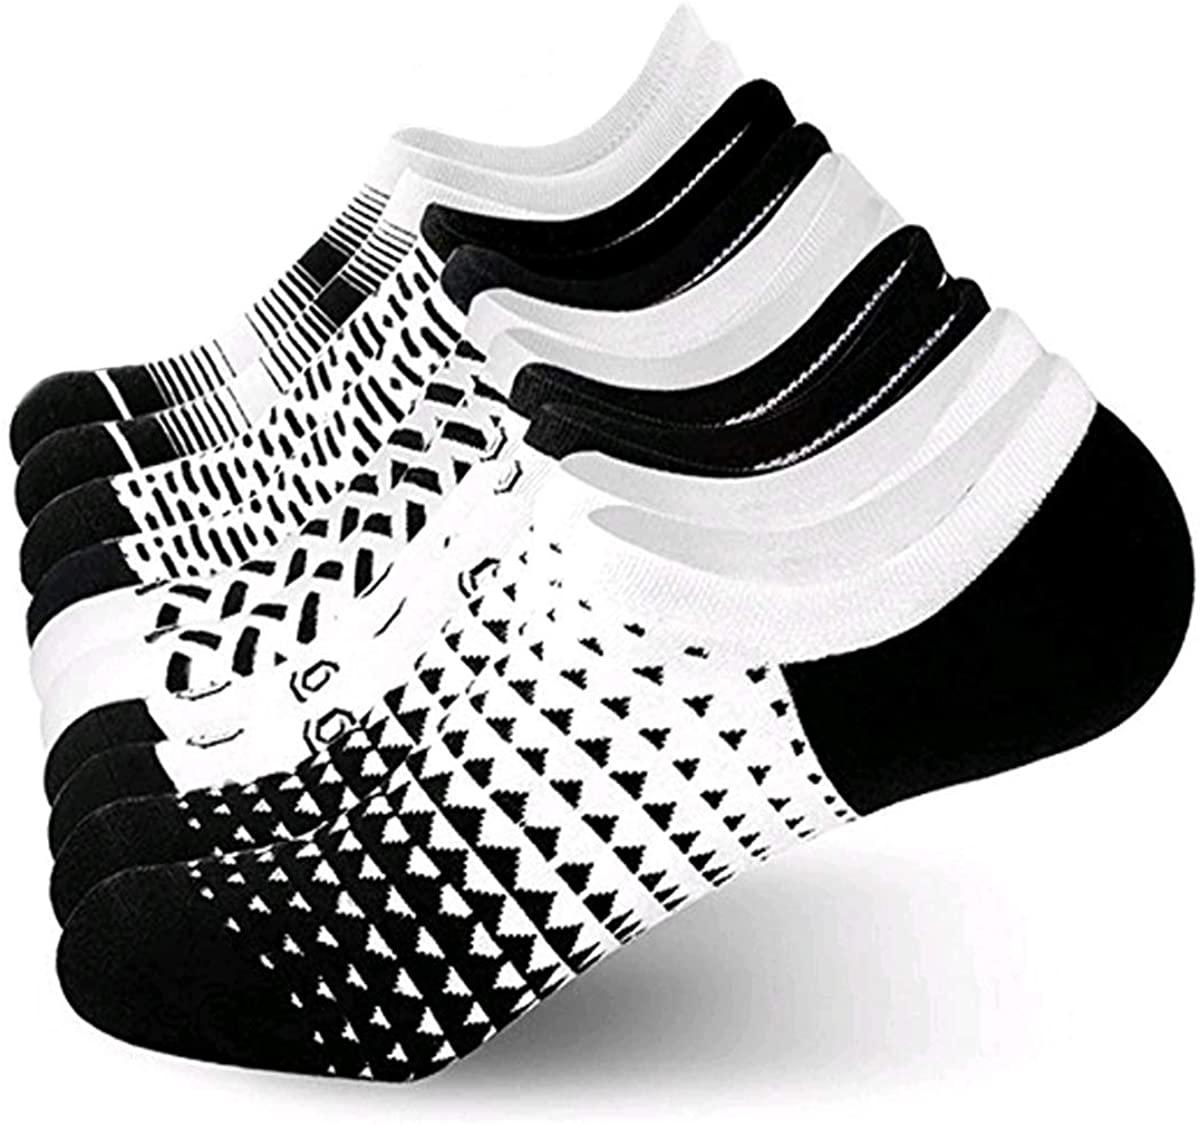 Six pack of Jurgen K No-Show Socks for Men in black and white patterns